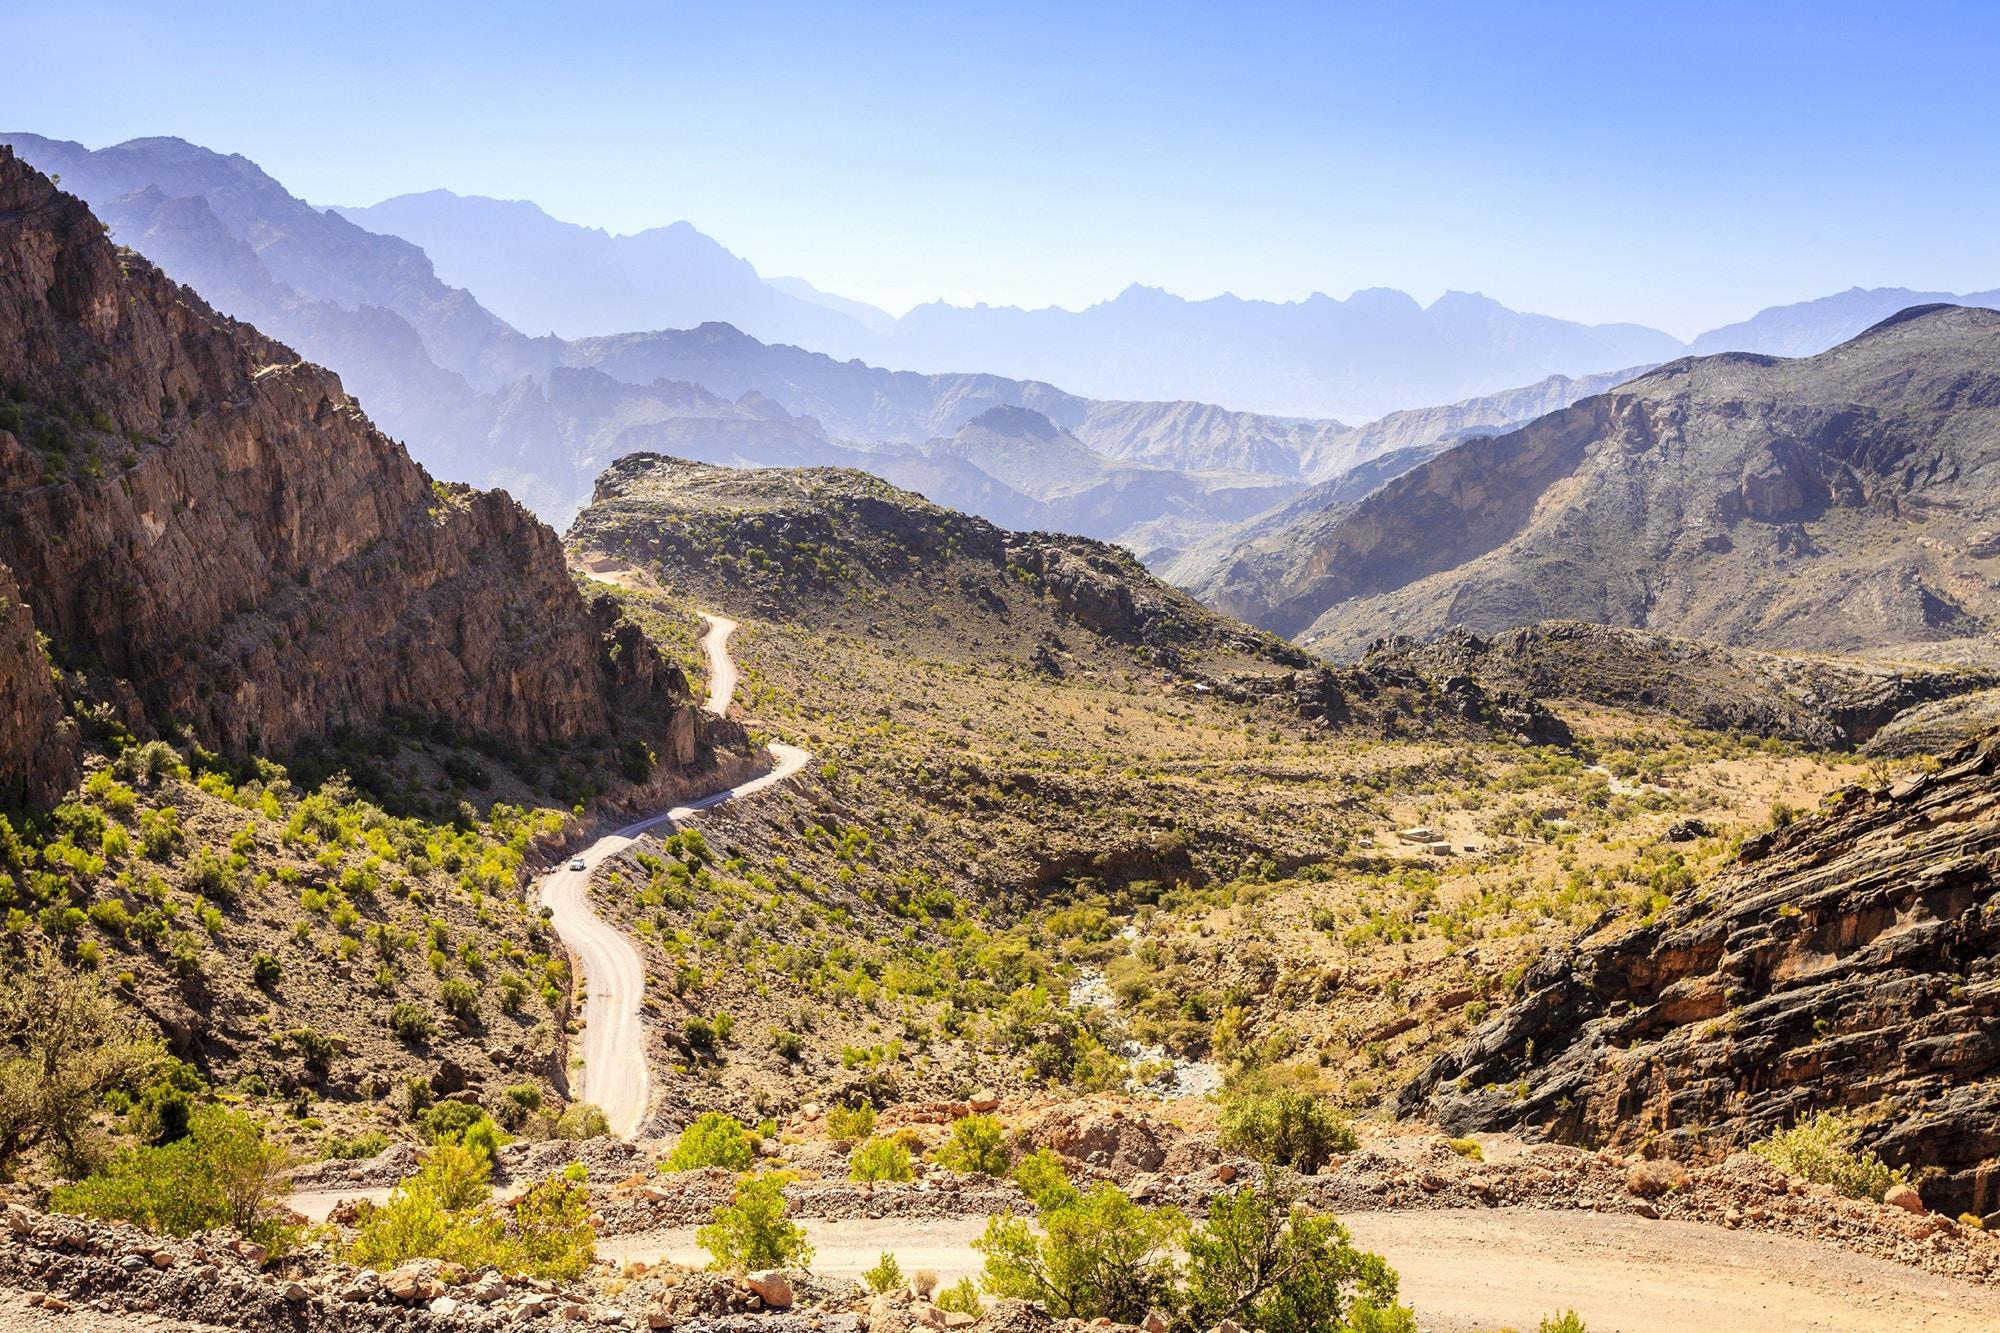 A road leading through Oman's Hajar Mountains © Alexey Stiop / Shutterstock